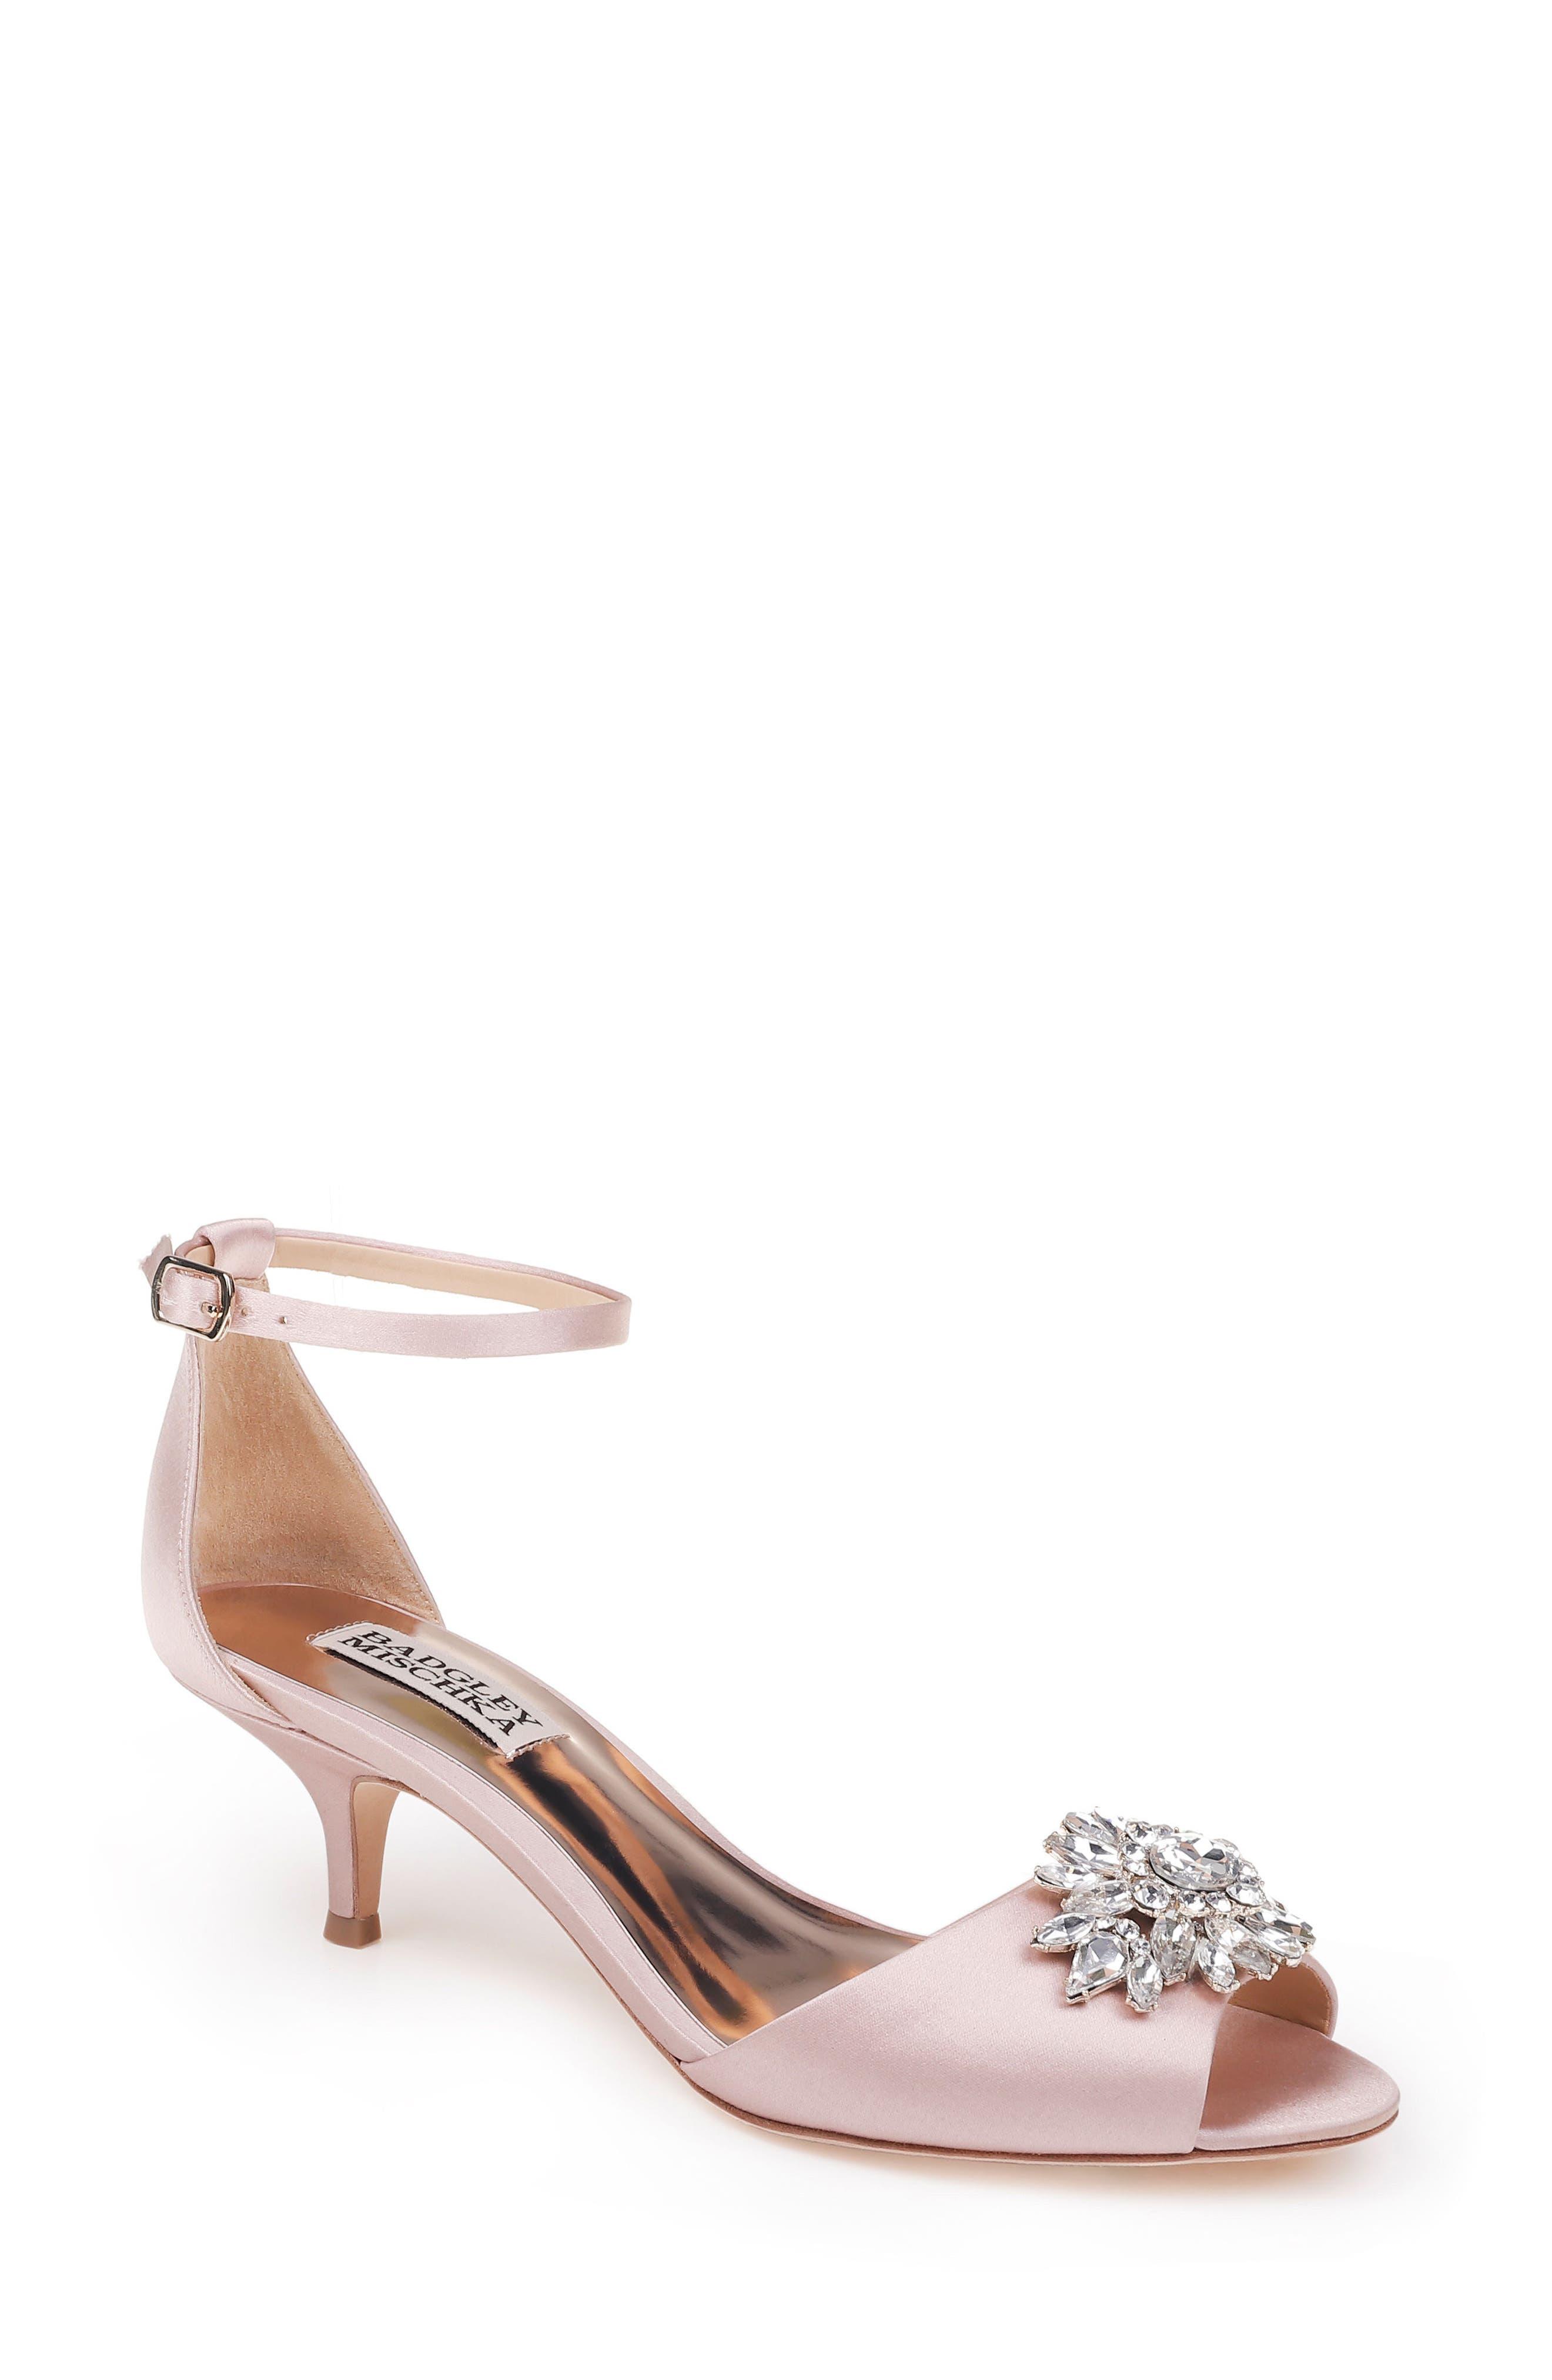 Main Image - Badgley Mischka Sainte Crystal Embellished Sandal (Women)